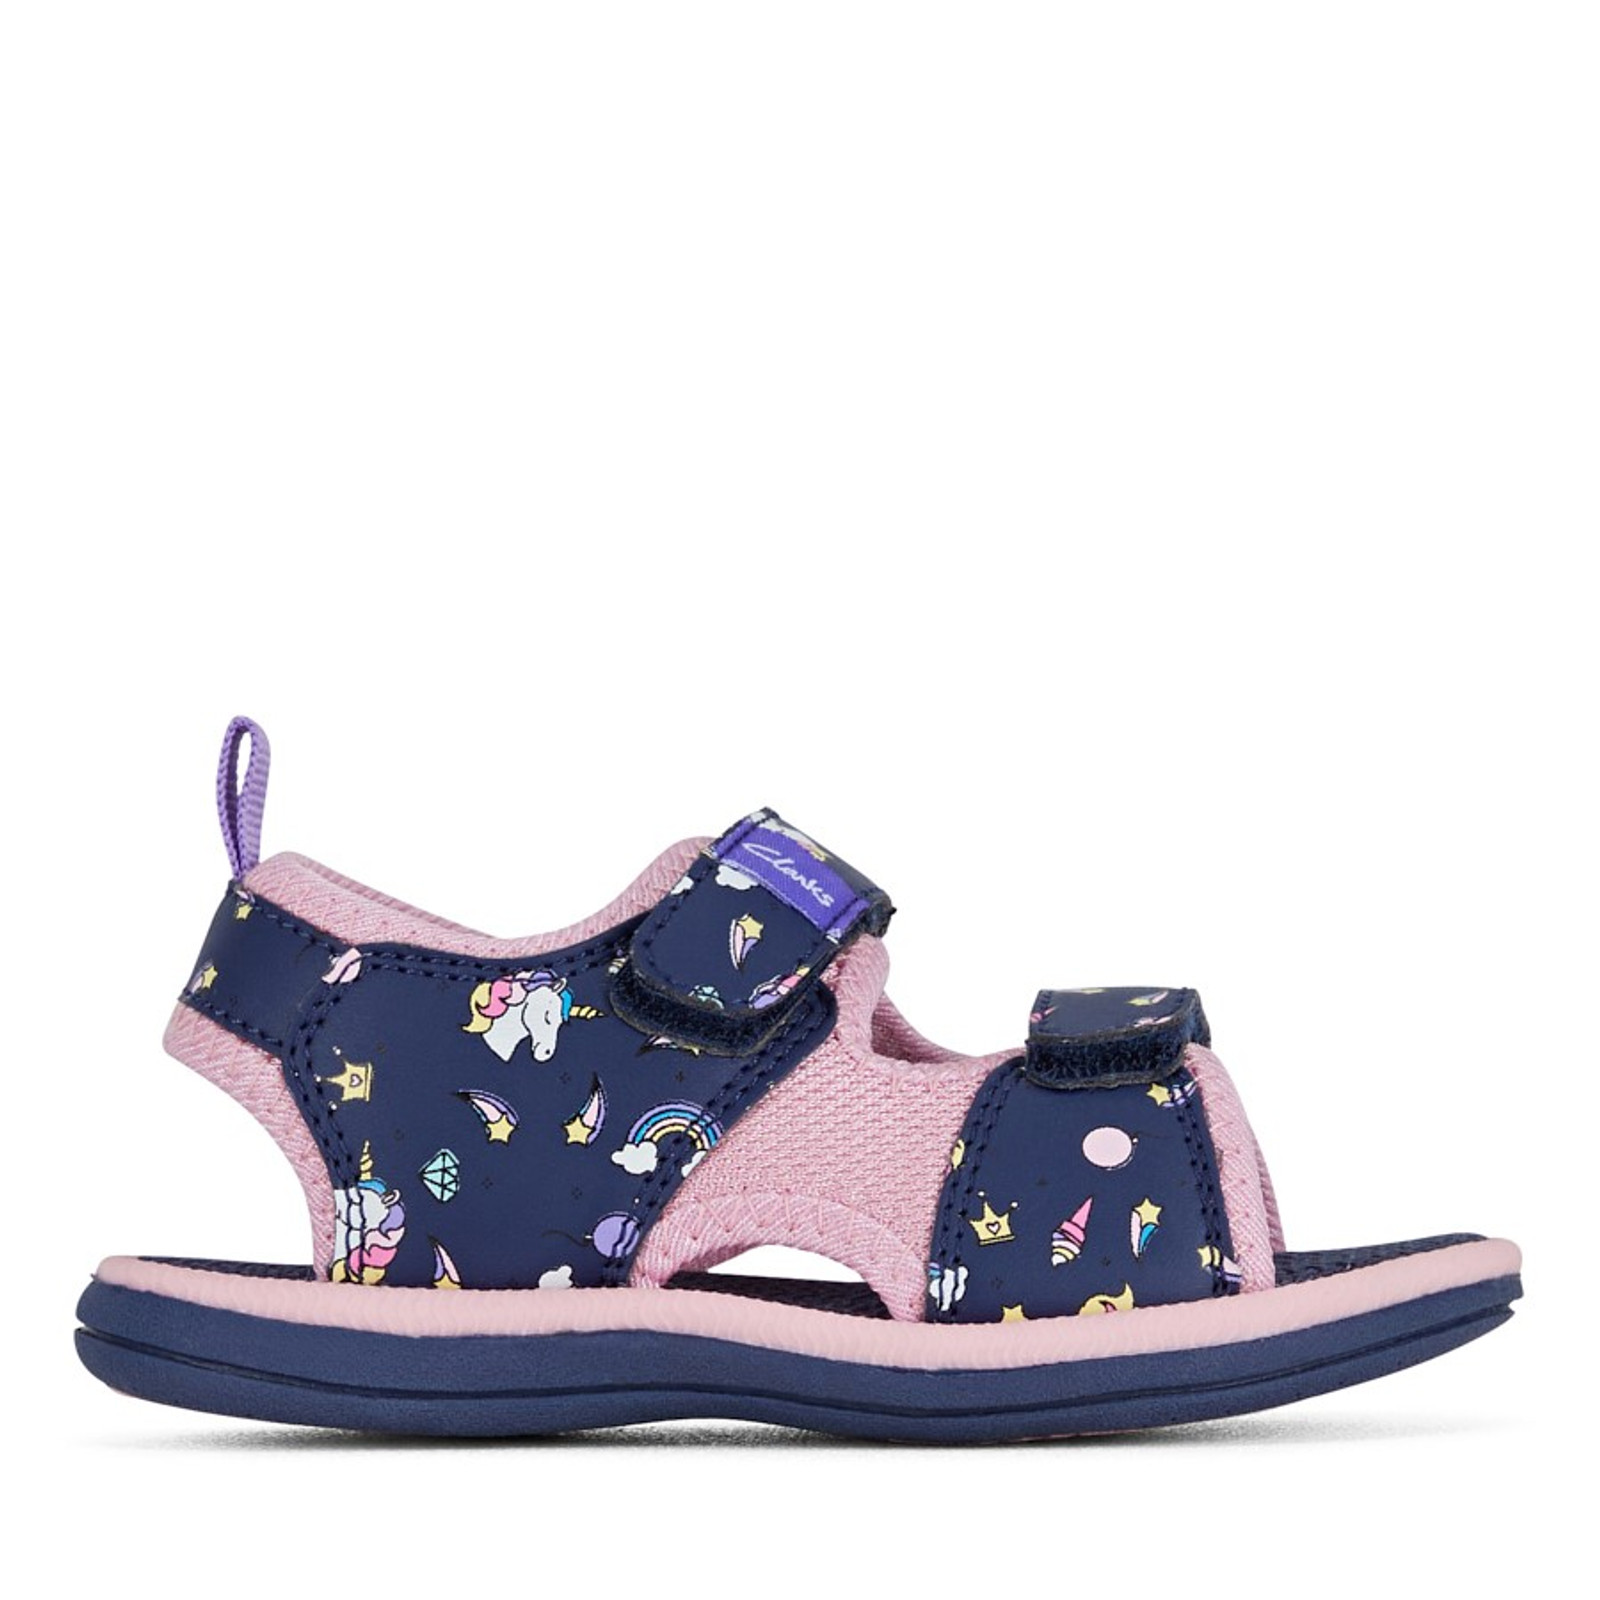 Clarks Girls FRIDA Navy/Pink